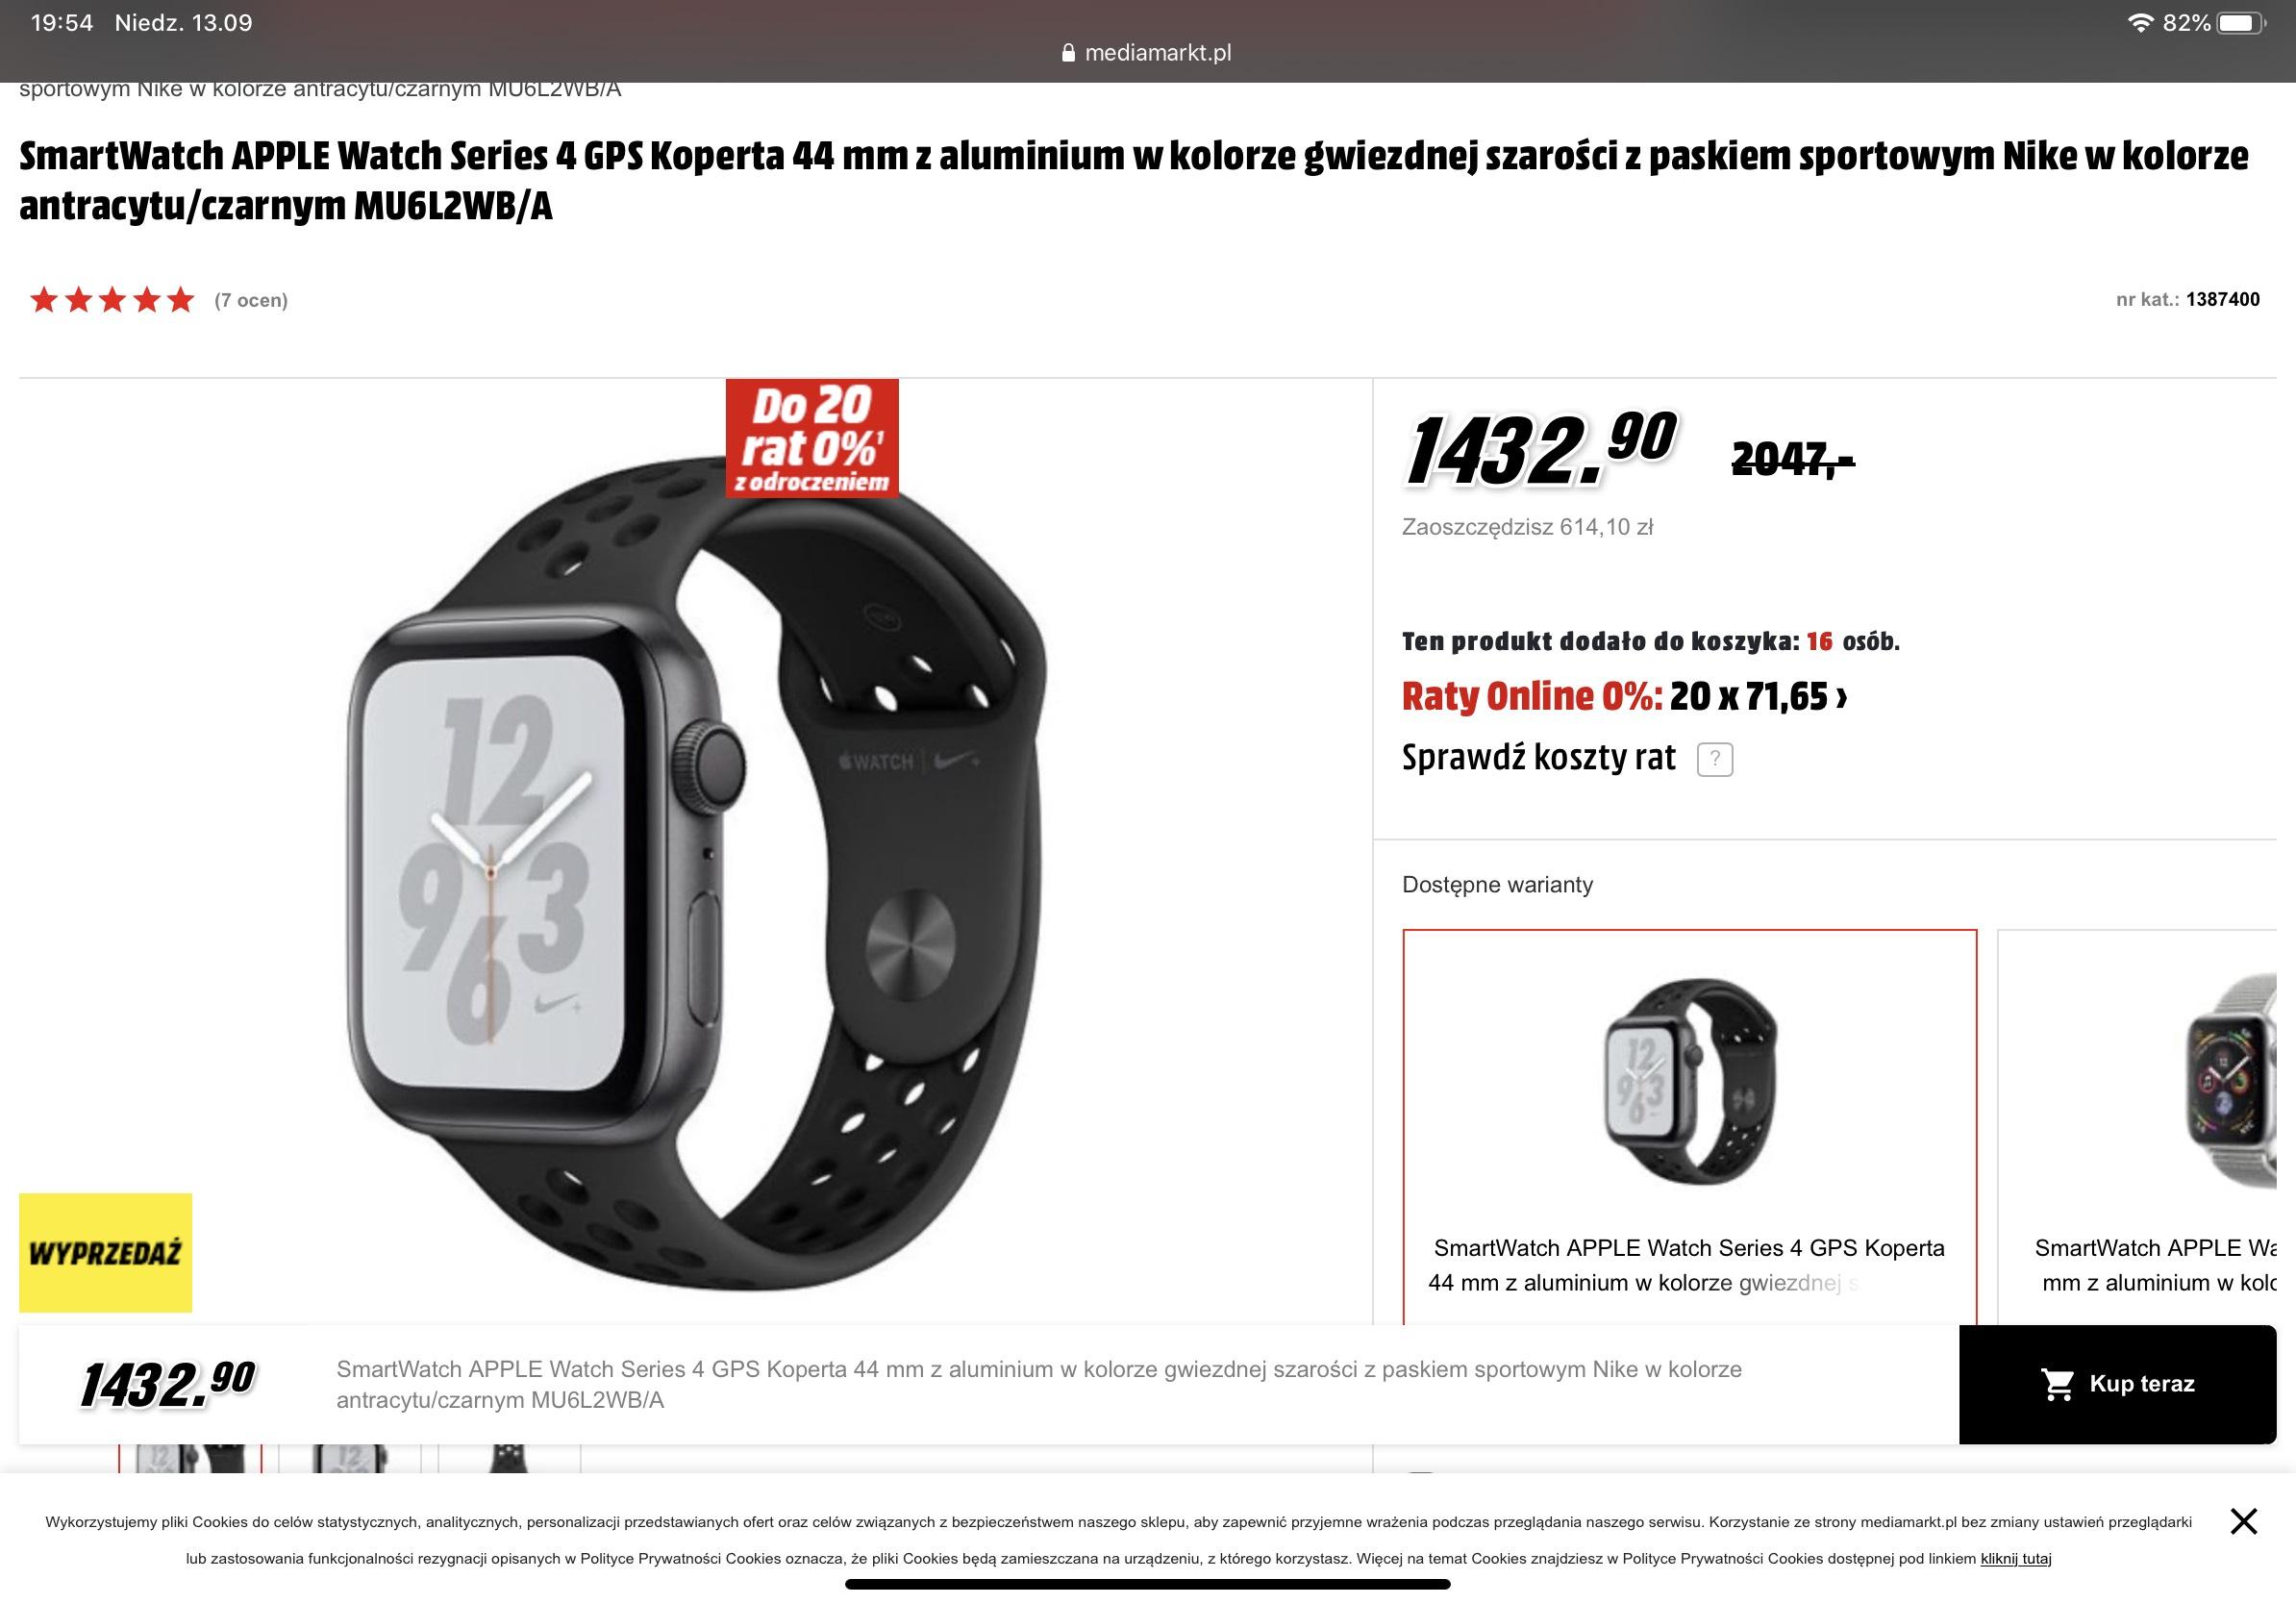 APPLE Watch Series 4 GPS Koperta 44 mm z aluminium